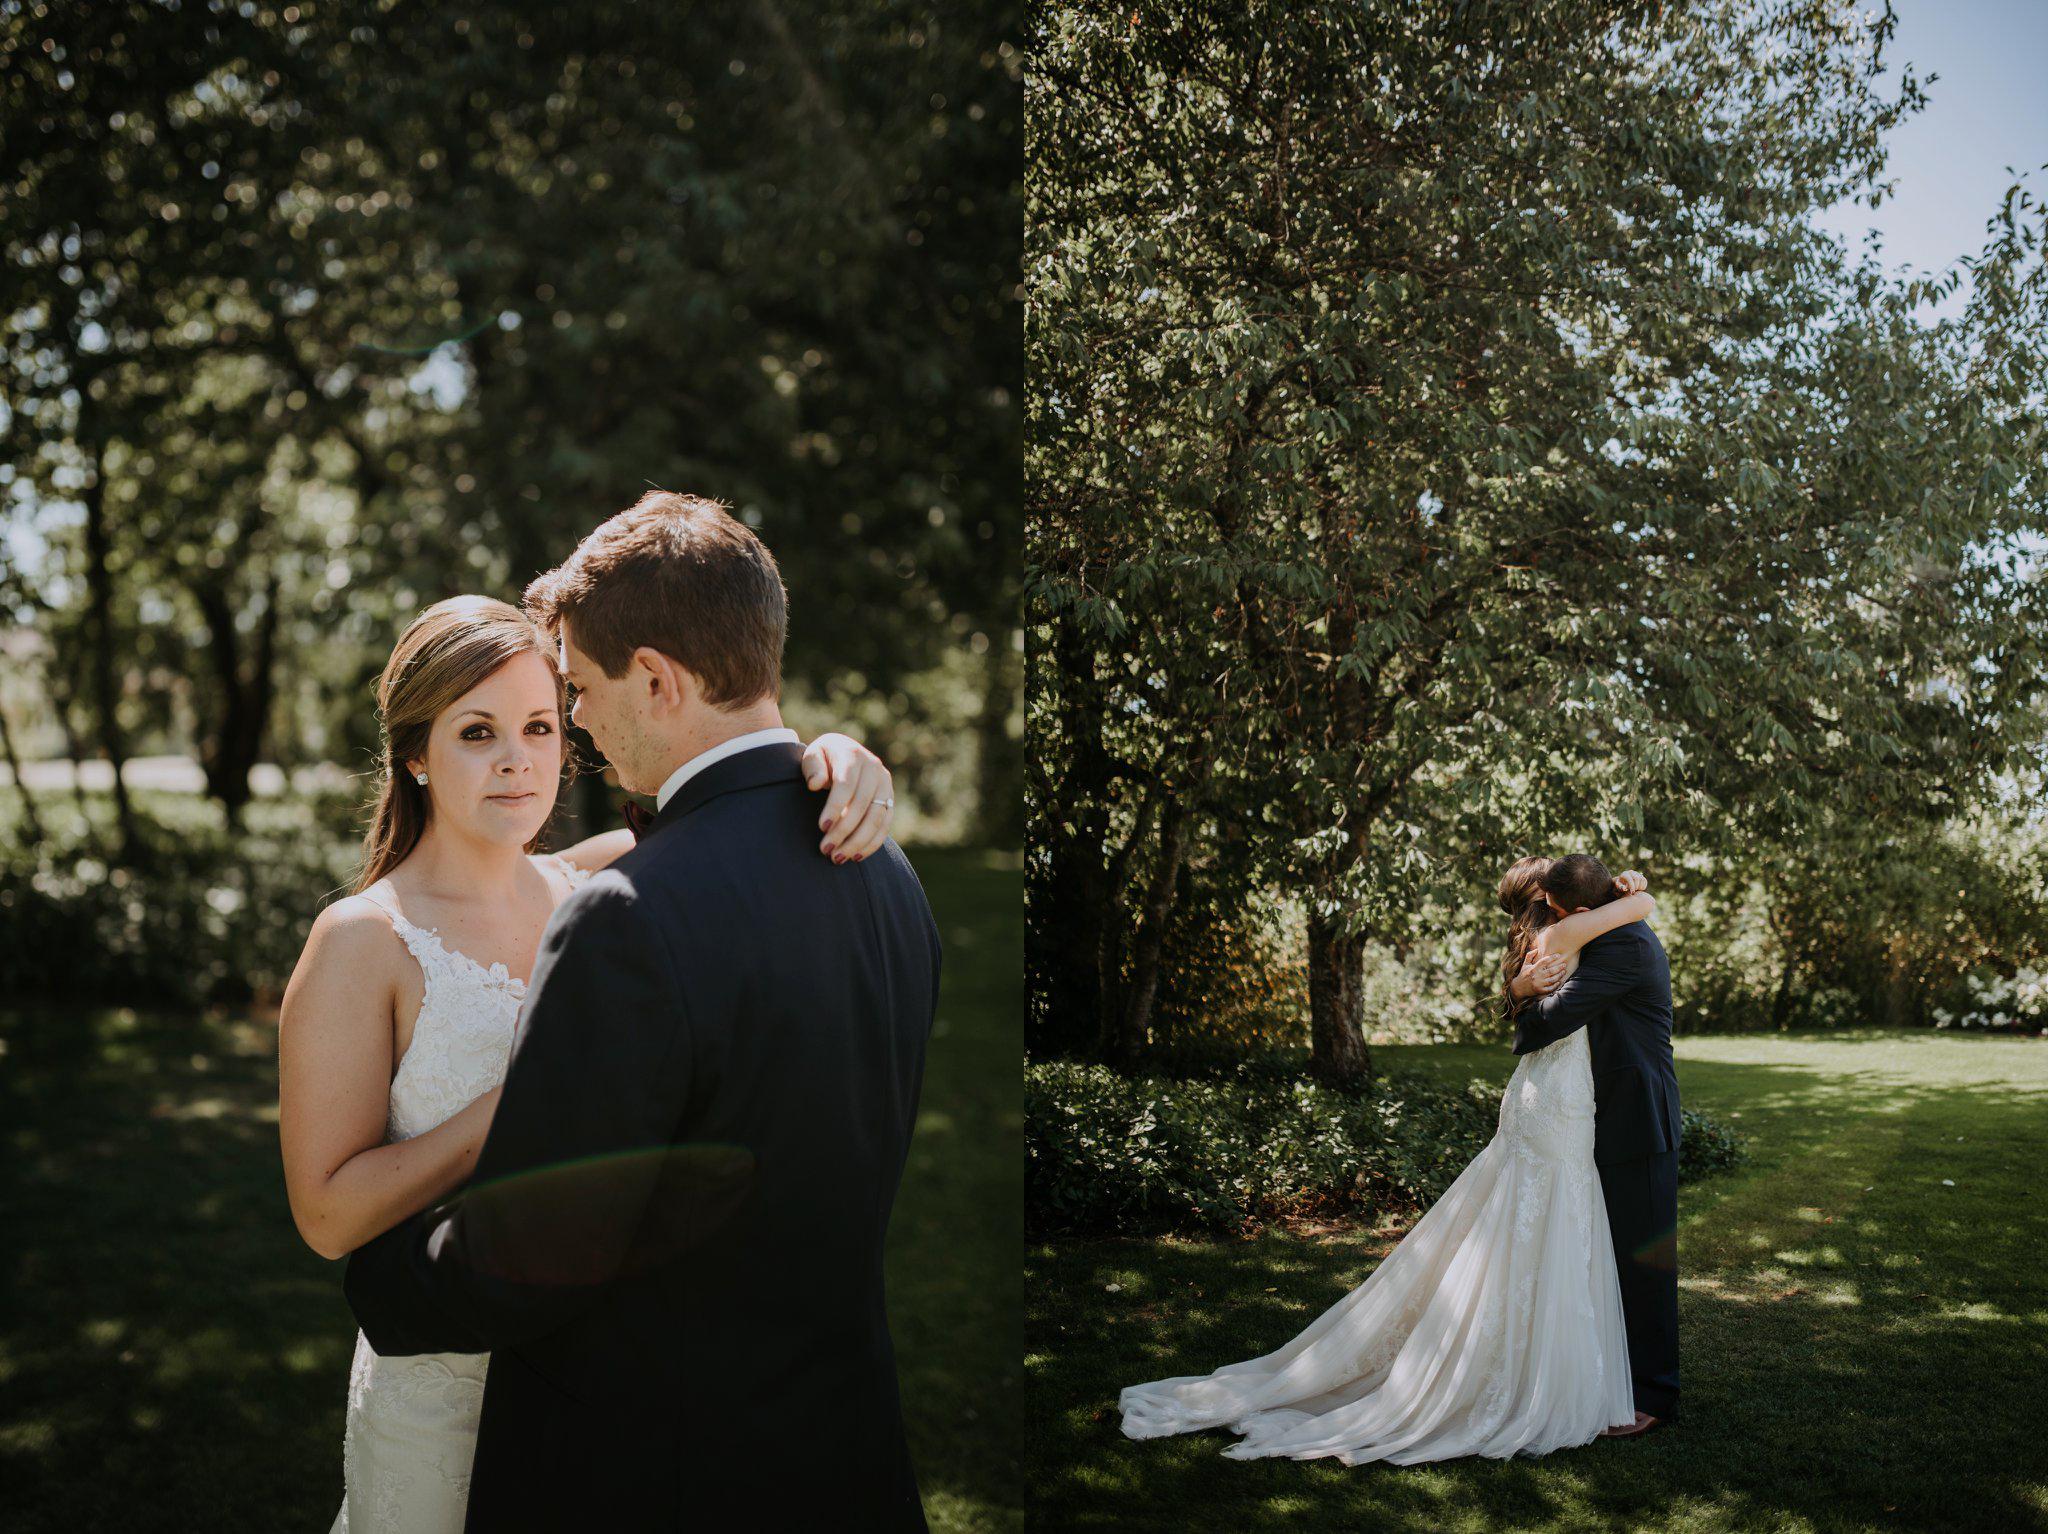 kristen-and-cody-the-kelley-farm-wedding-seattle-photographer-caitlyn-nikula-34.jpg